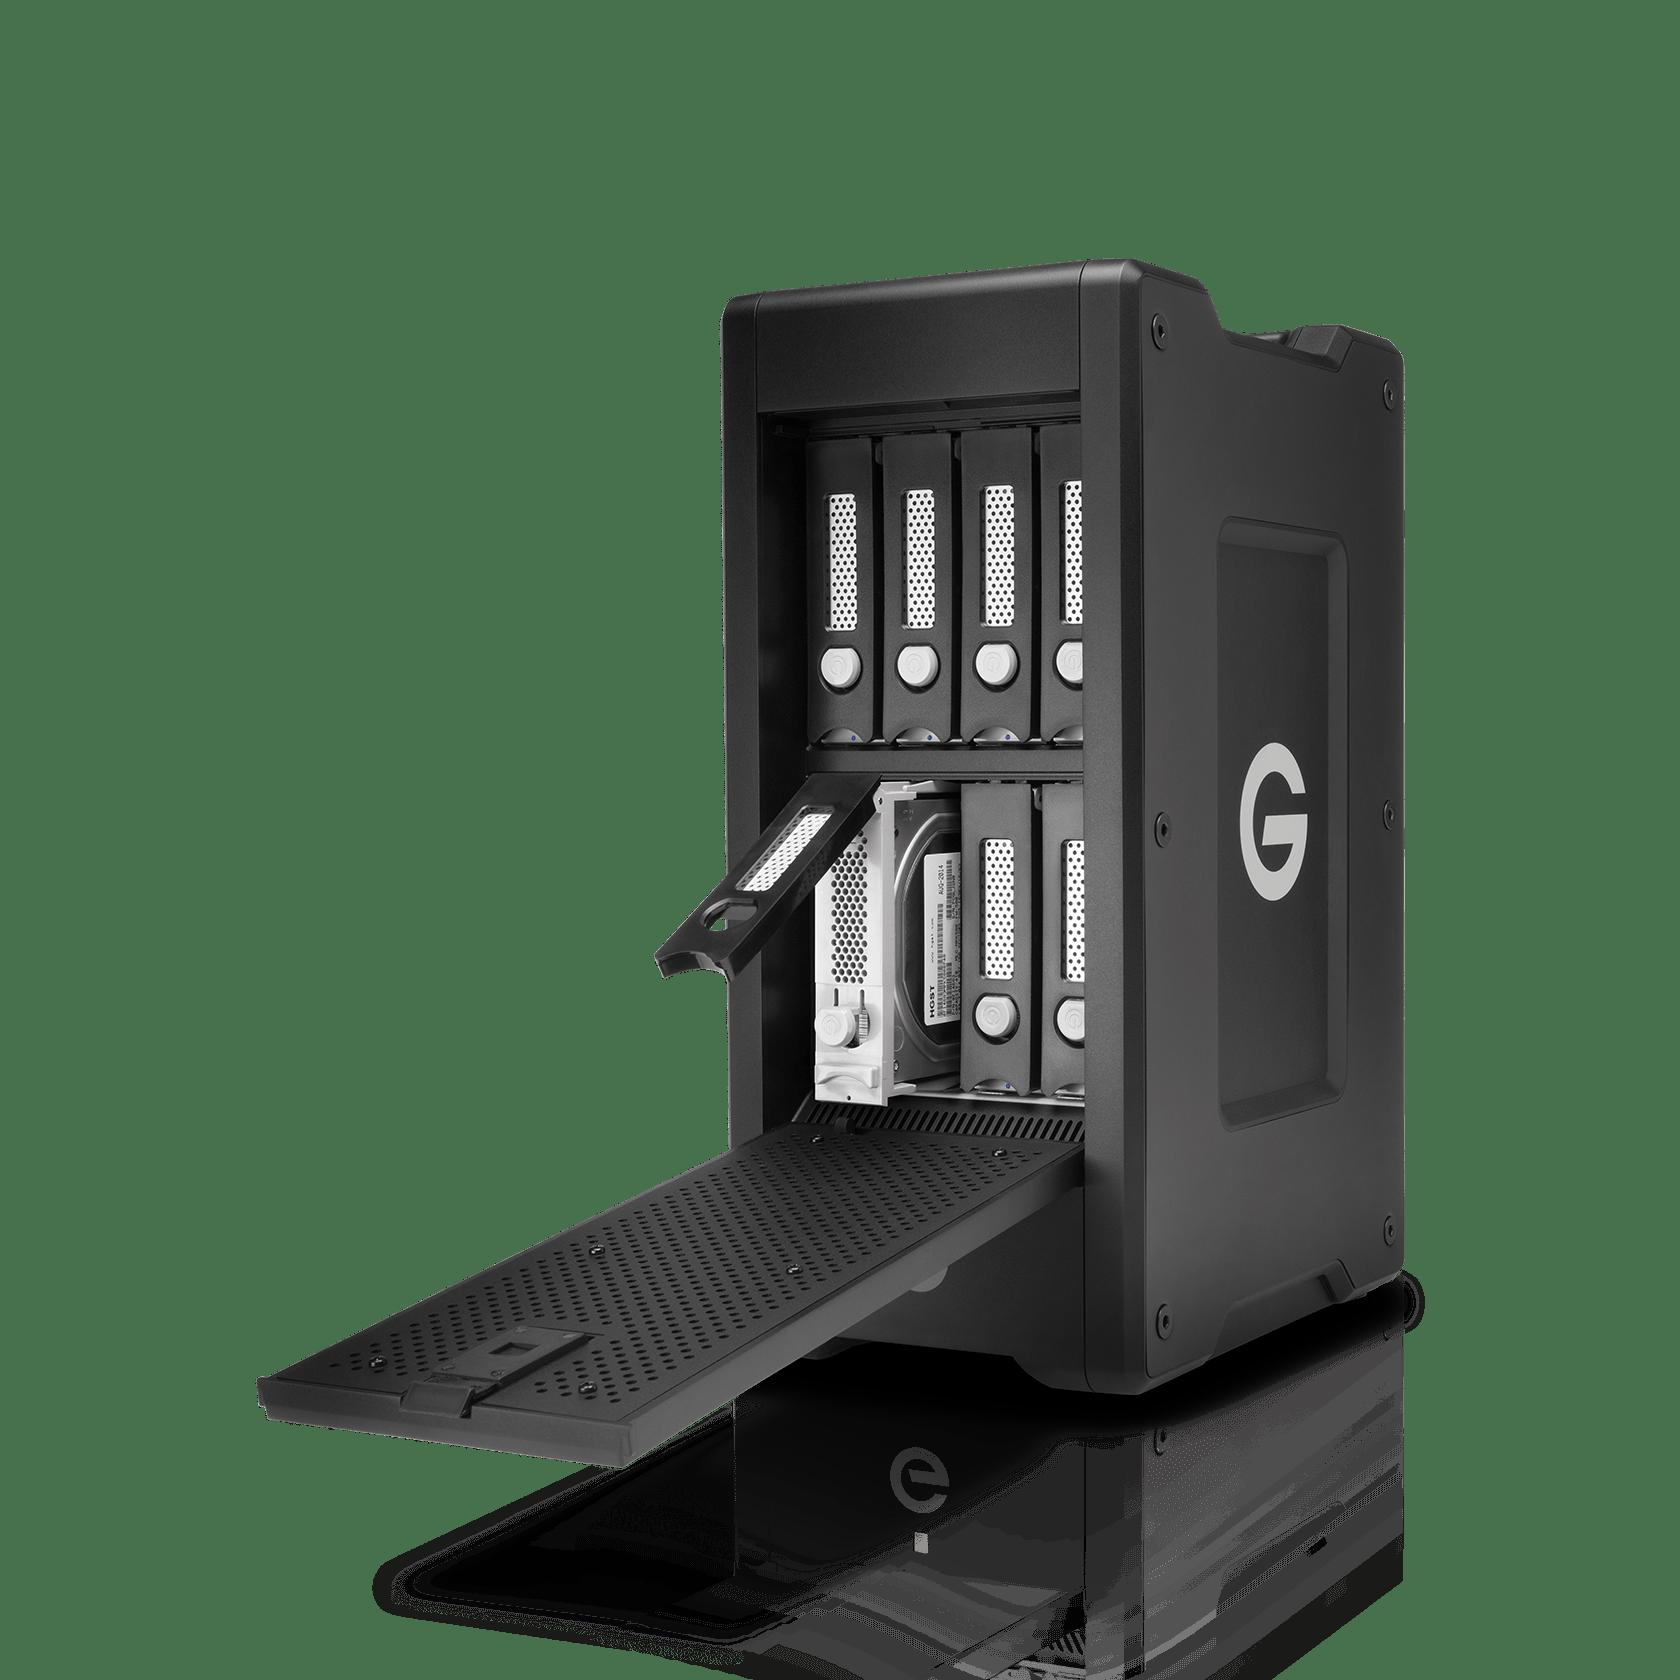 WesternDigital coupon: G-Technology 24TB G-SPEED Shuttle XL Thunderbolt 2, 8-Bay Storage System - 0G04647